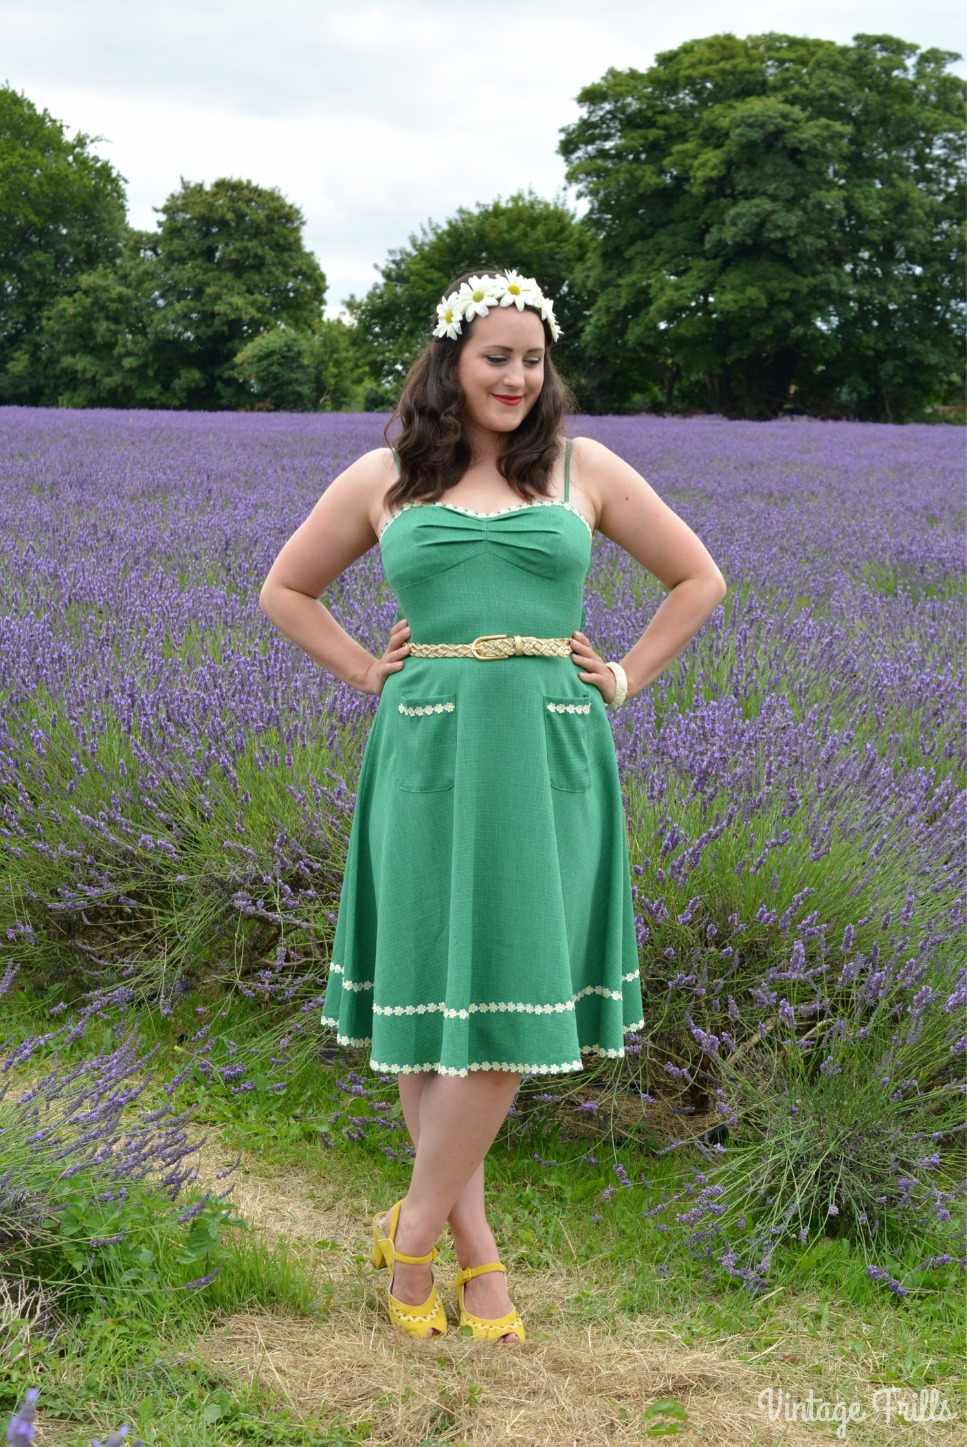 Daisies and Lavender – Voodoo Vixen Deliliah Dress Review